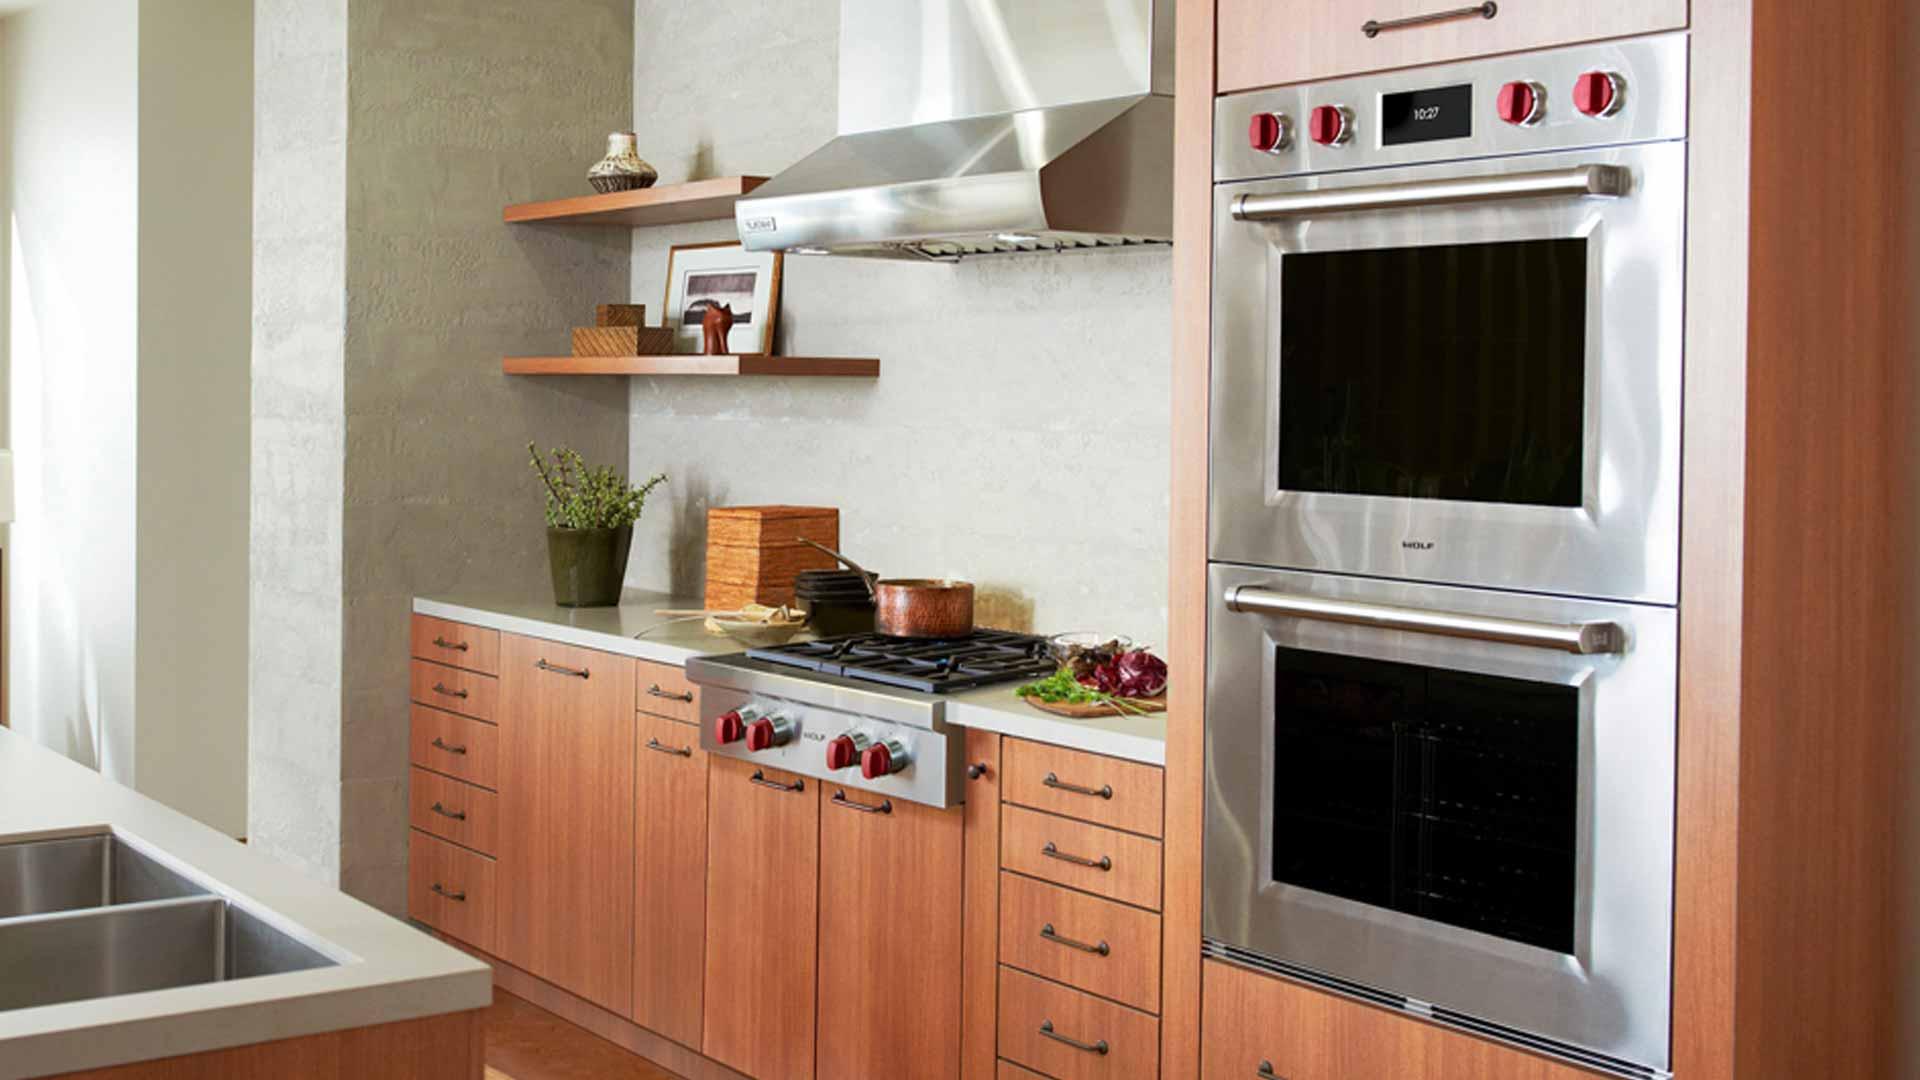 Wolf Built-in Oven Appliances Repair | Wolf Appliance Repair Pros